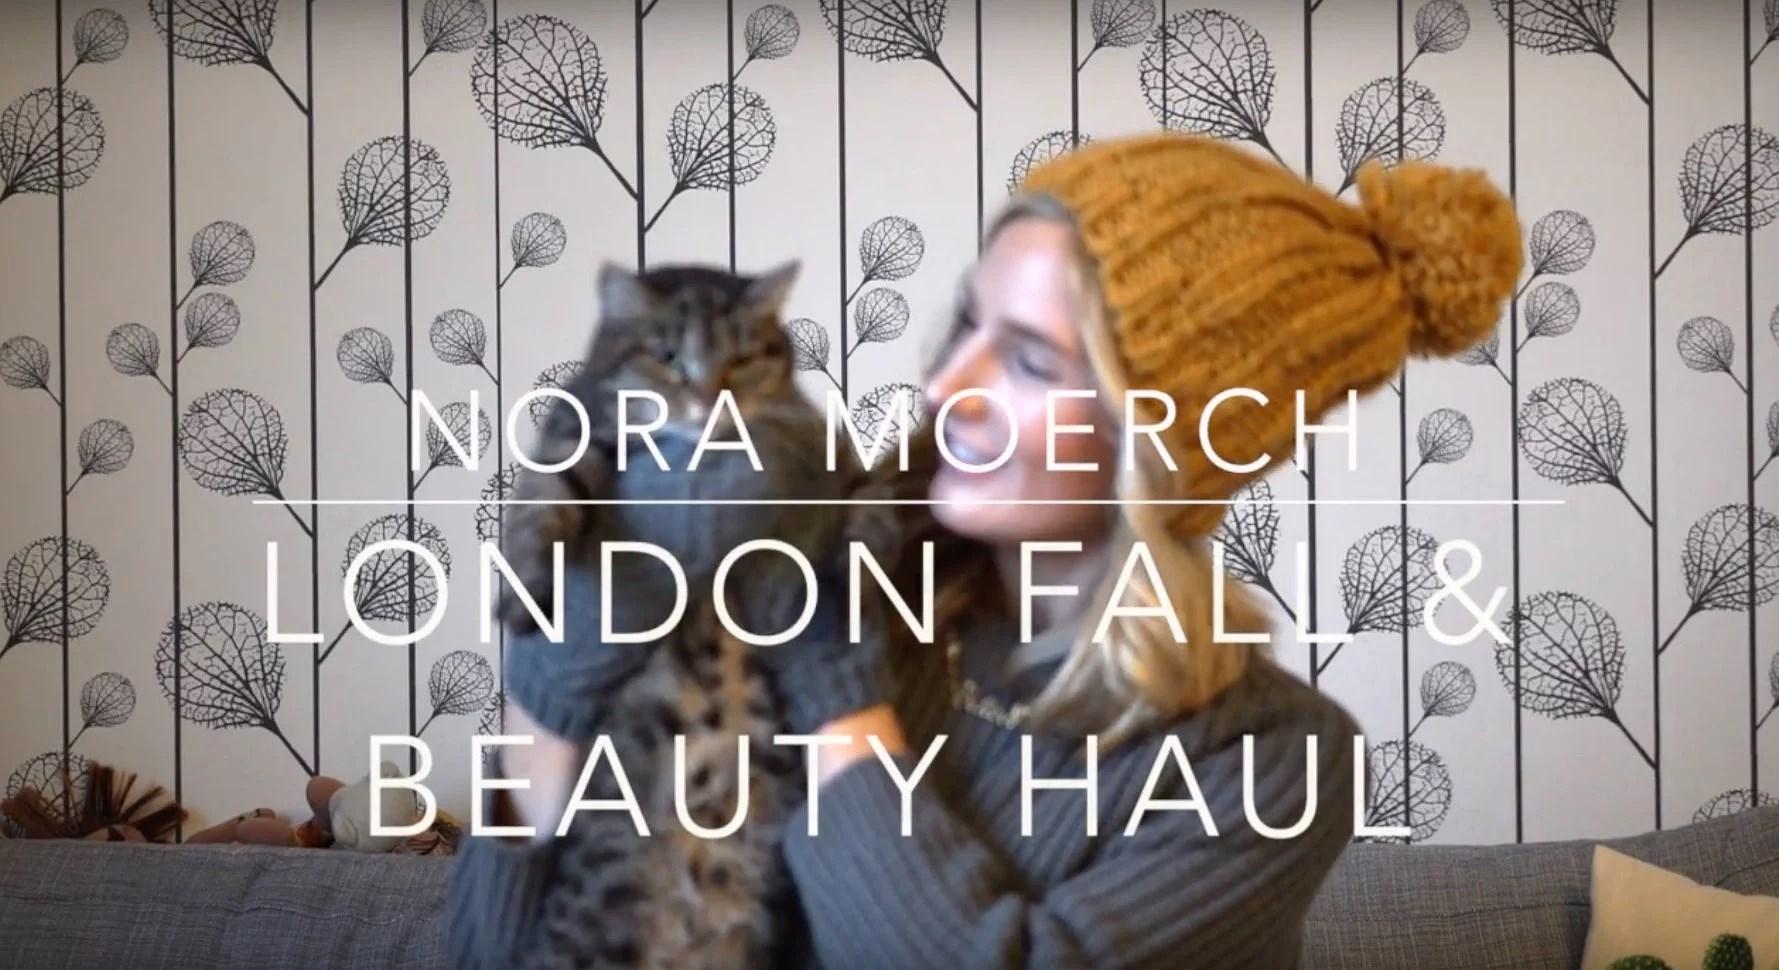 London Fall Accessories & Beauty Haul Video